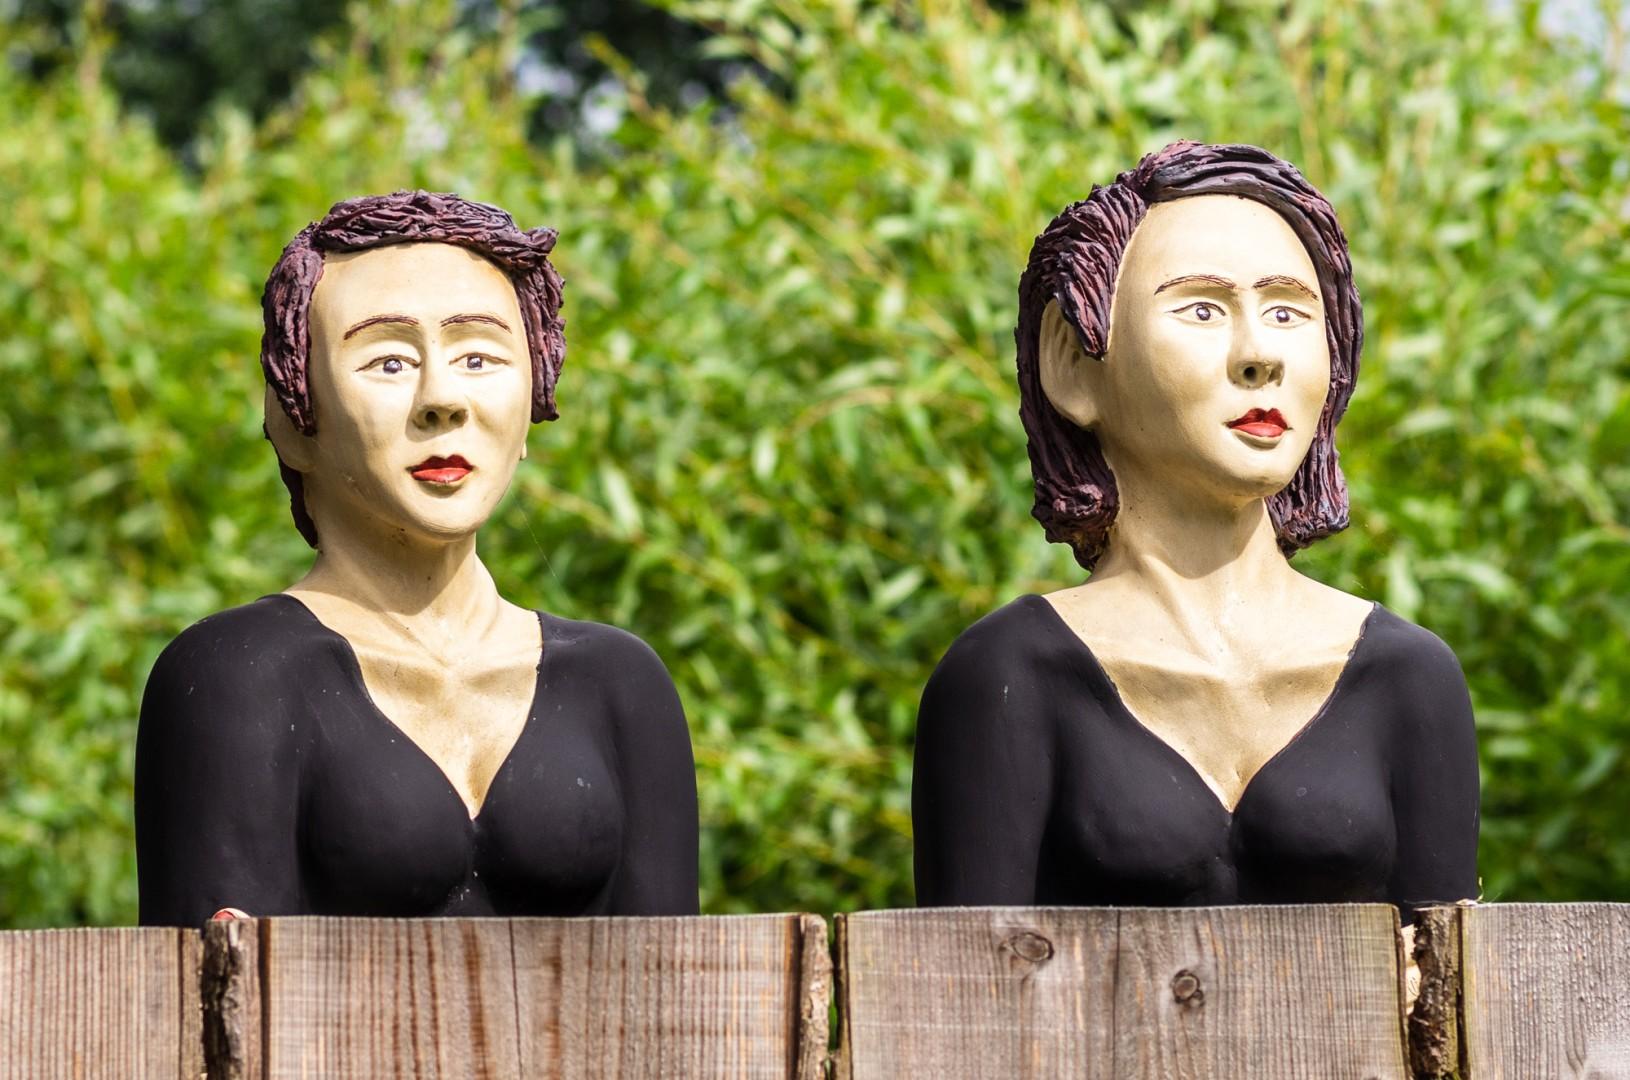 2 Keramikbüsten hinter Lärchenholzzaun, Höhe ca. 45 cm, frostfest